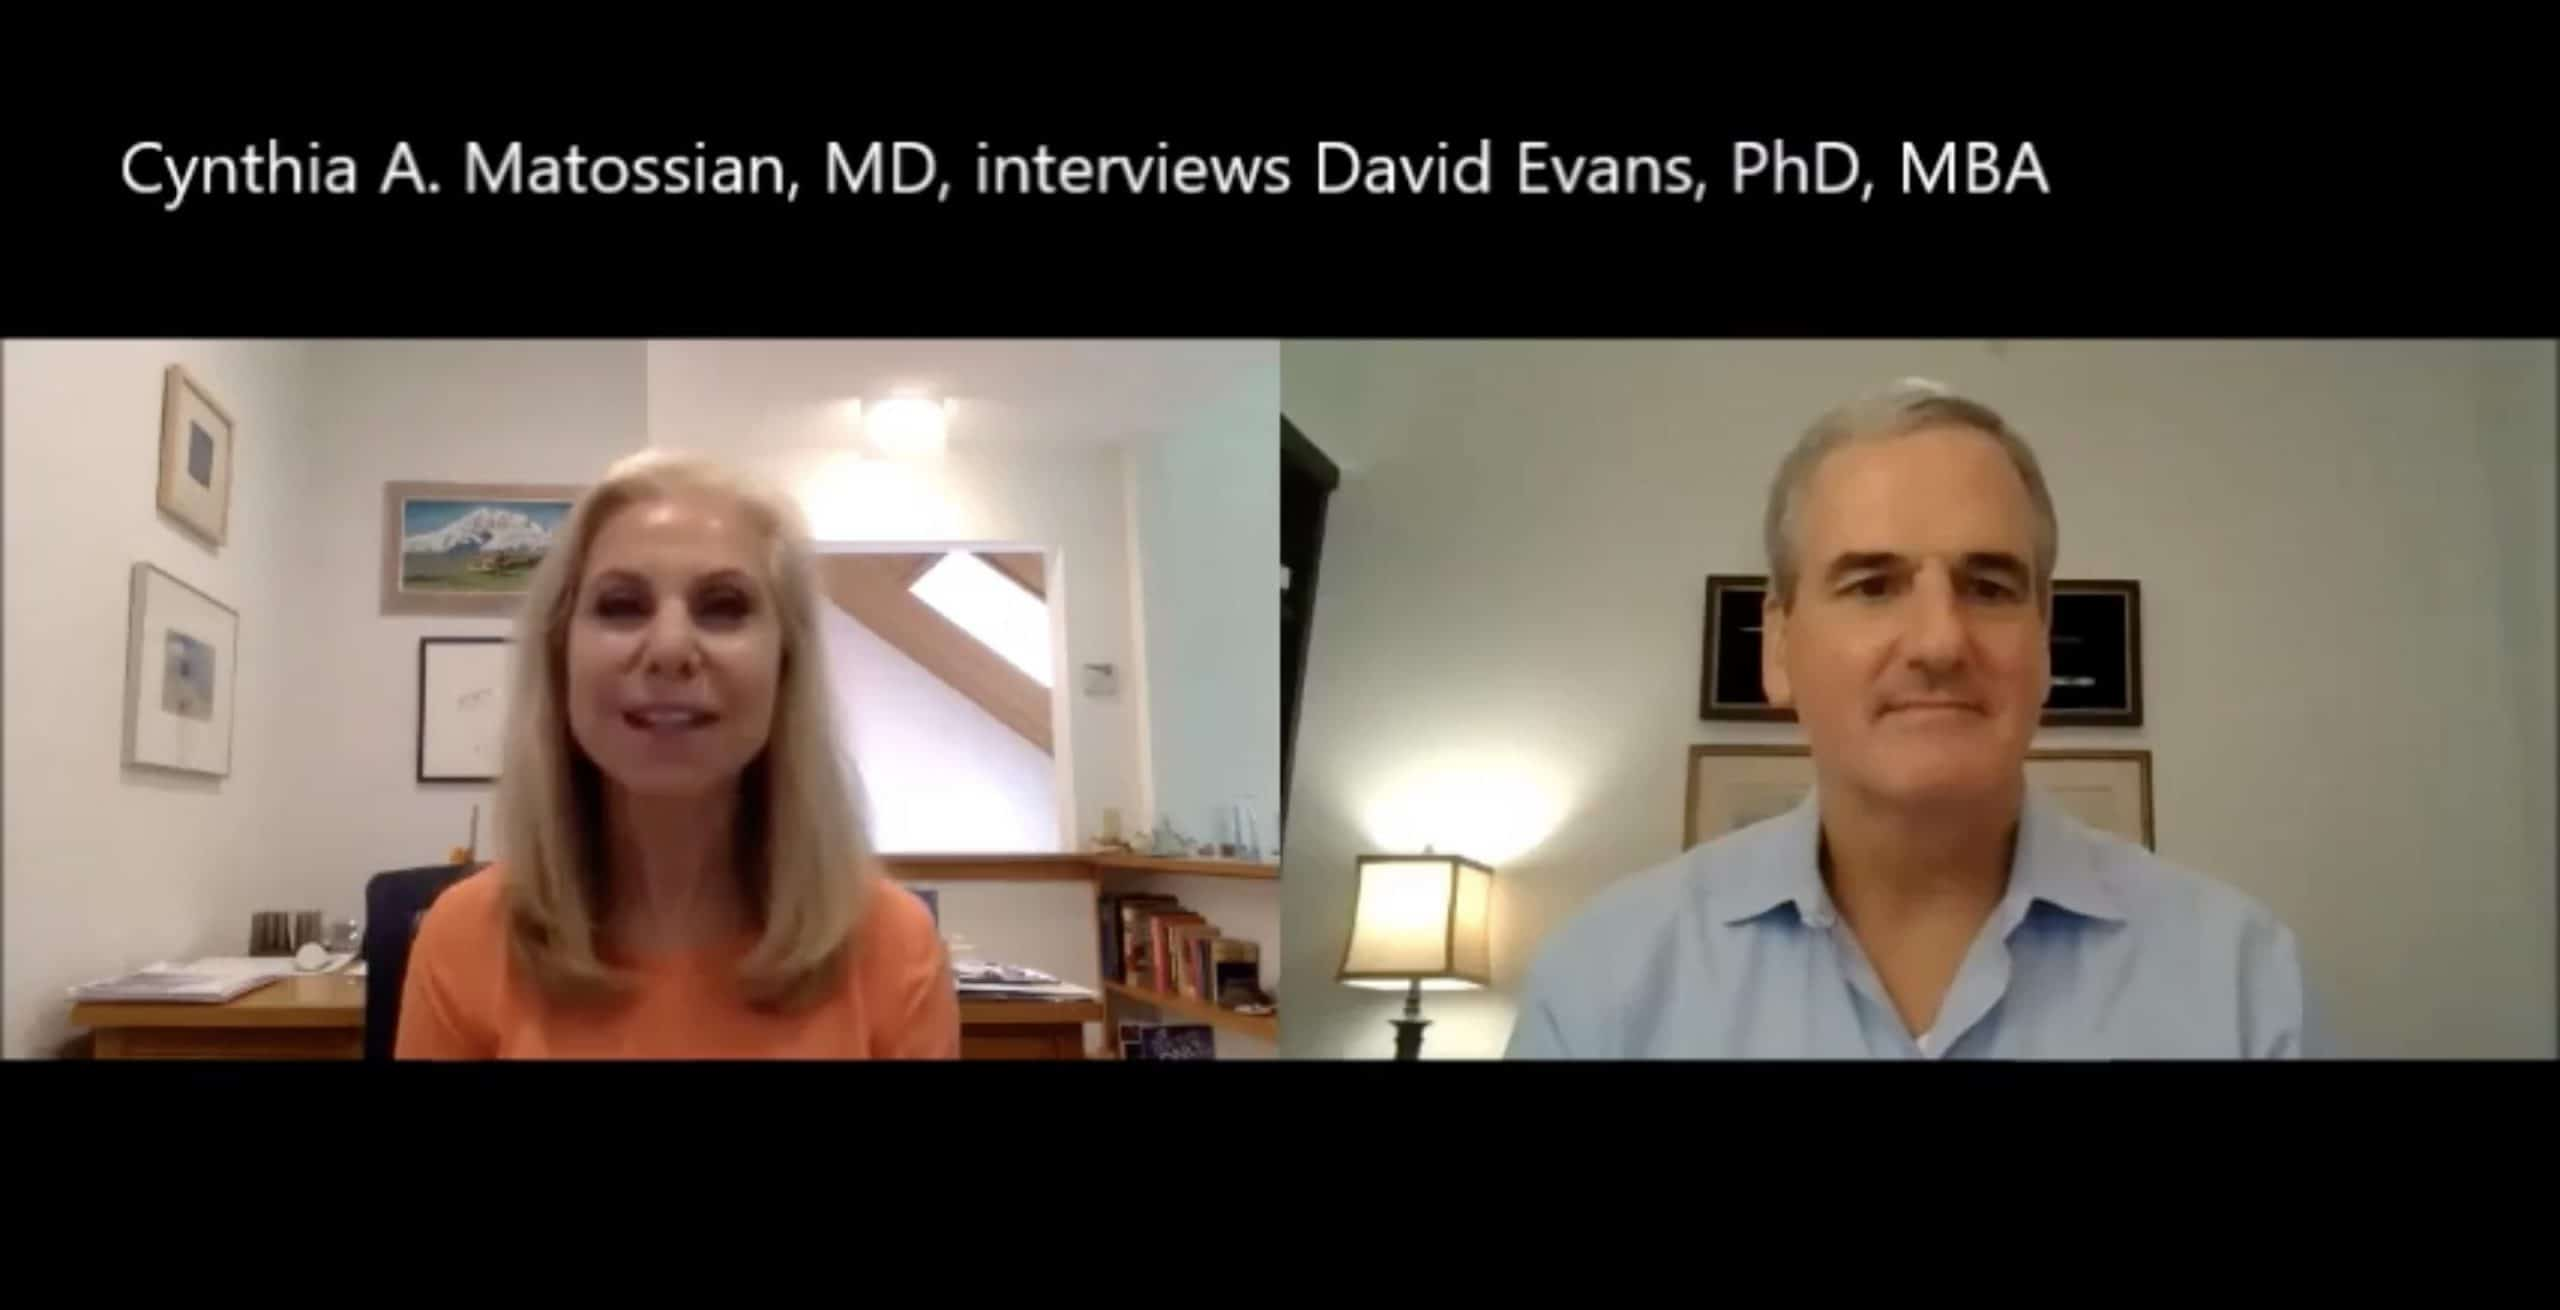 Cynthia A. Matossian, MD, interviews David Evans, PhD, MBA